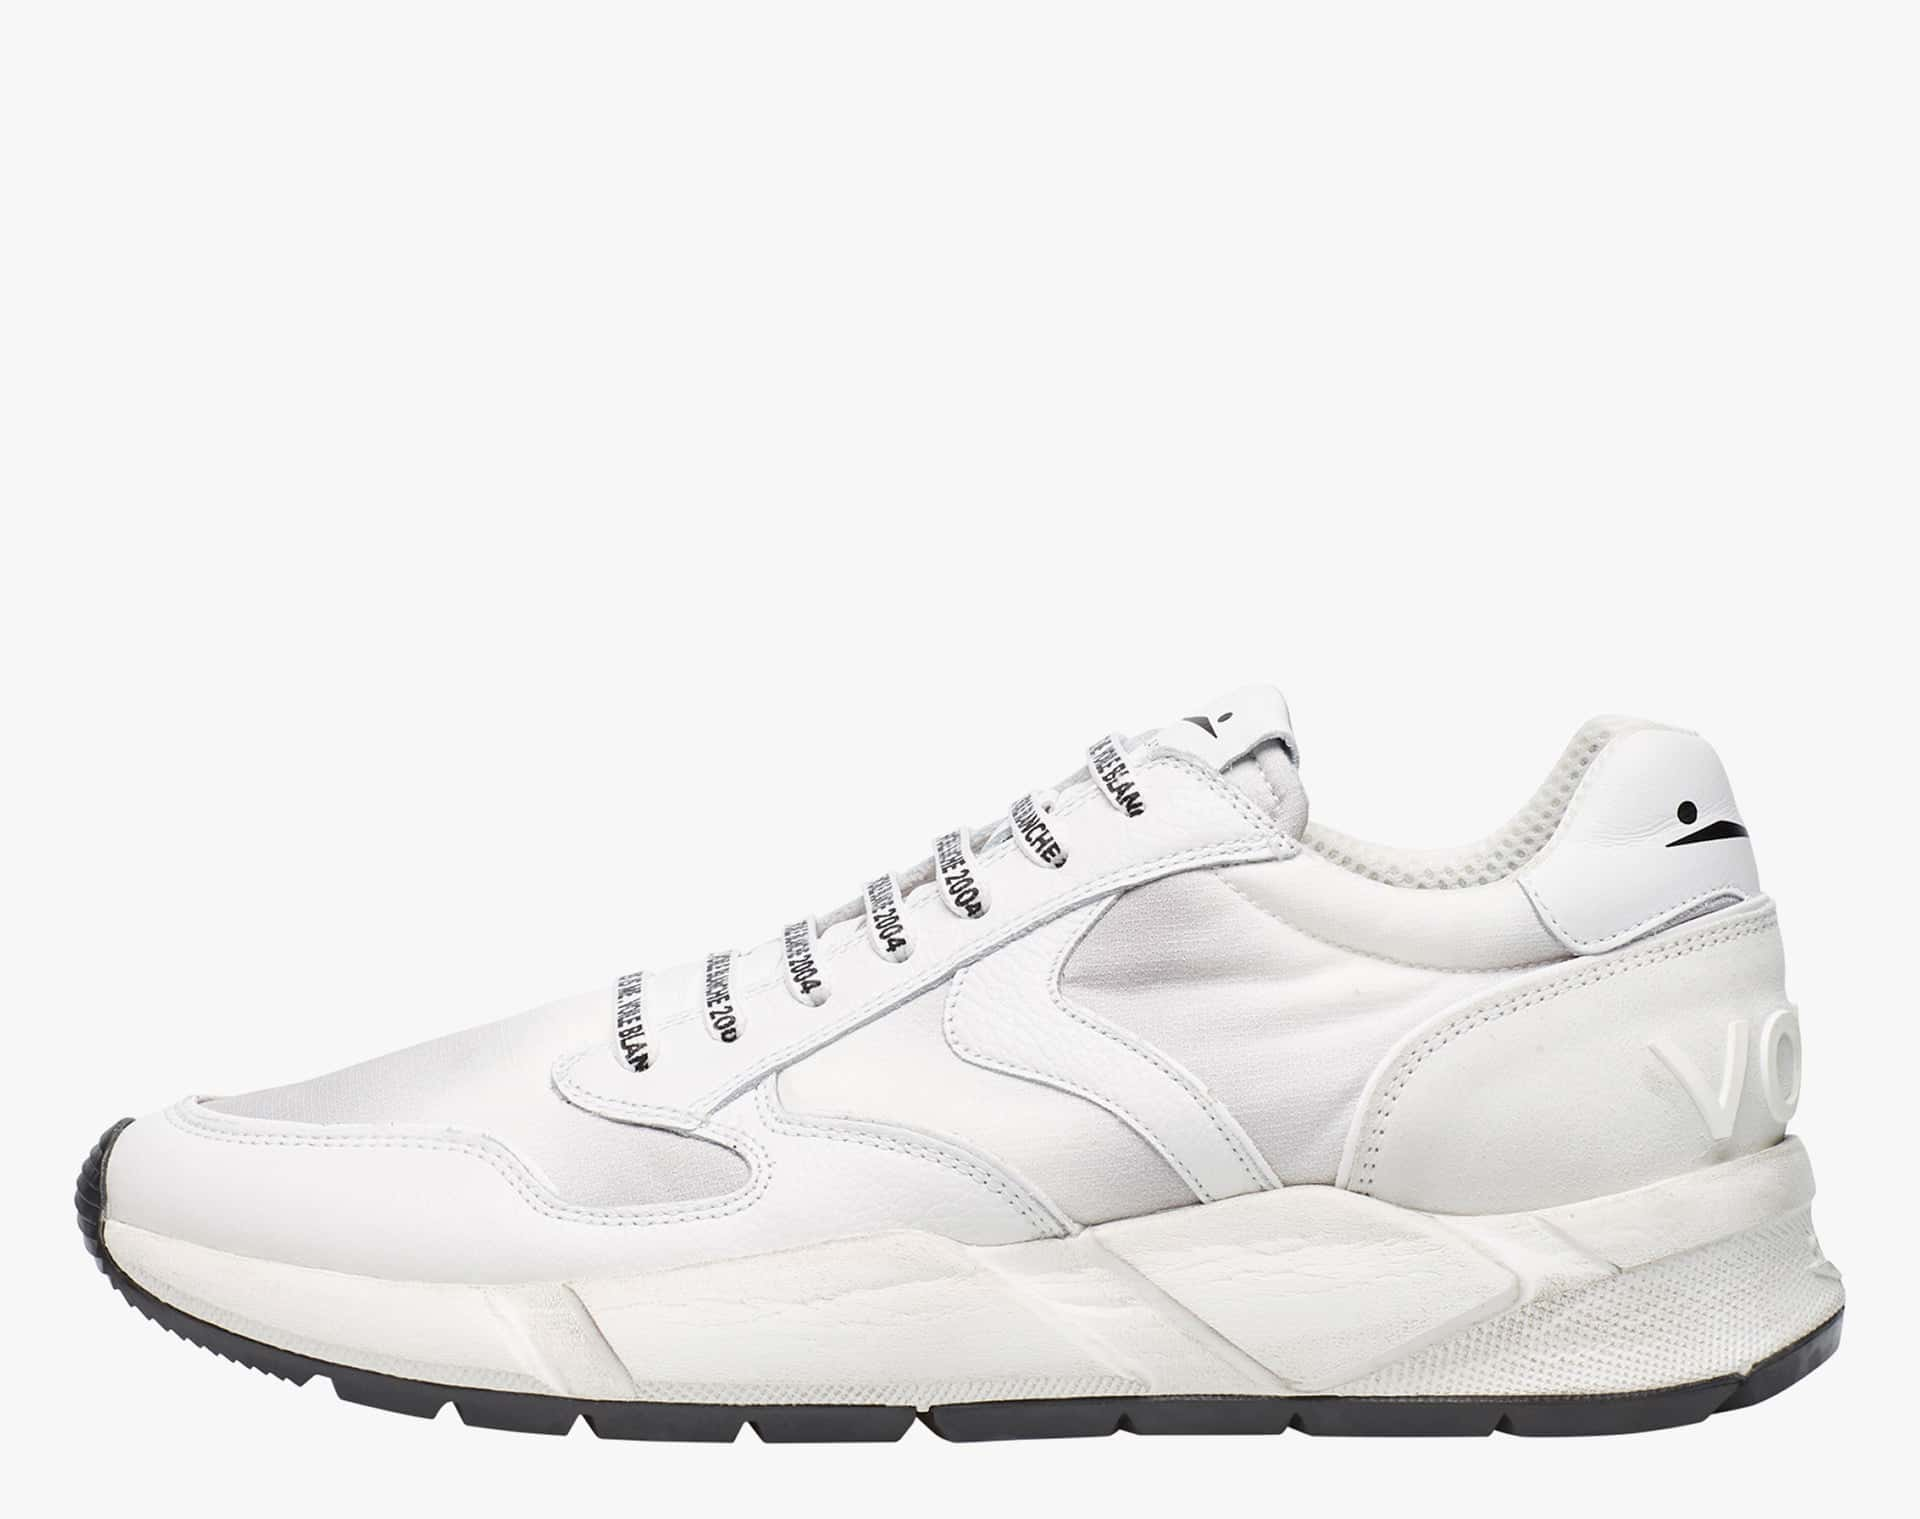 Sneaker in vitello e tessuto sfumato Bianco-ARPOLH